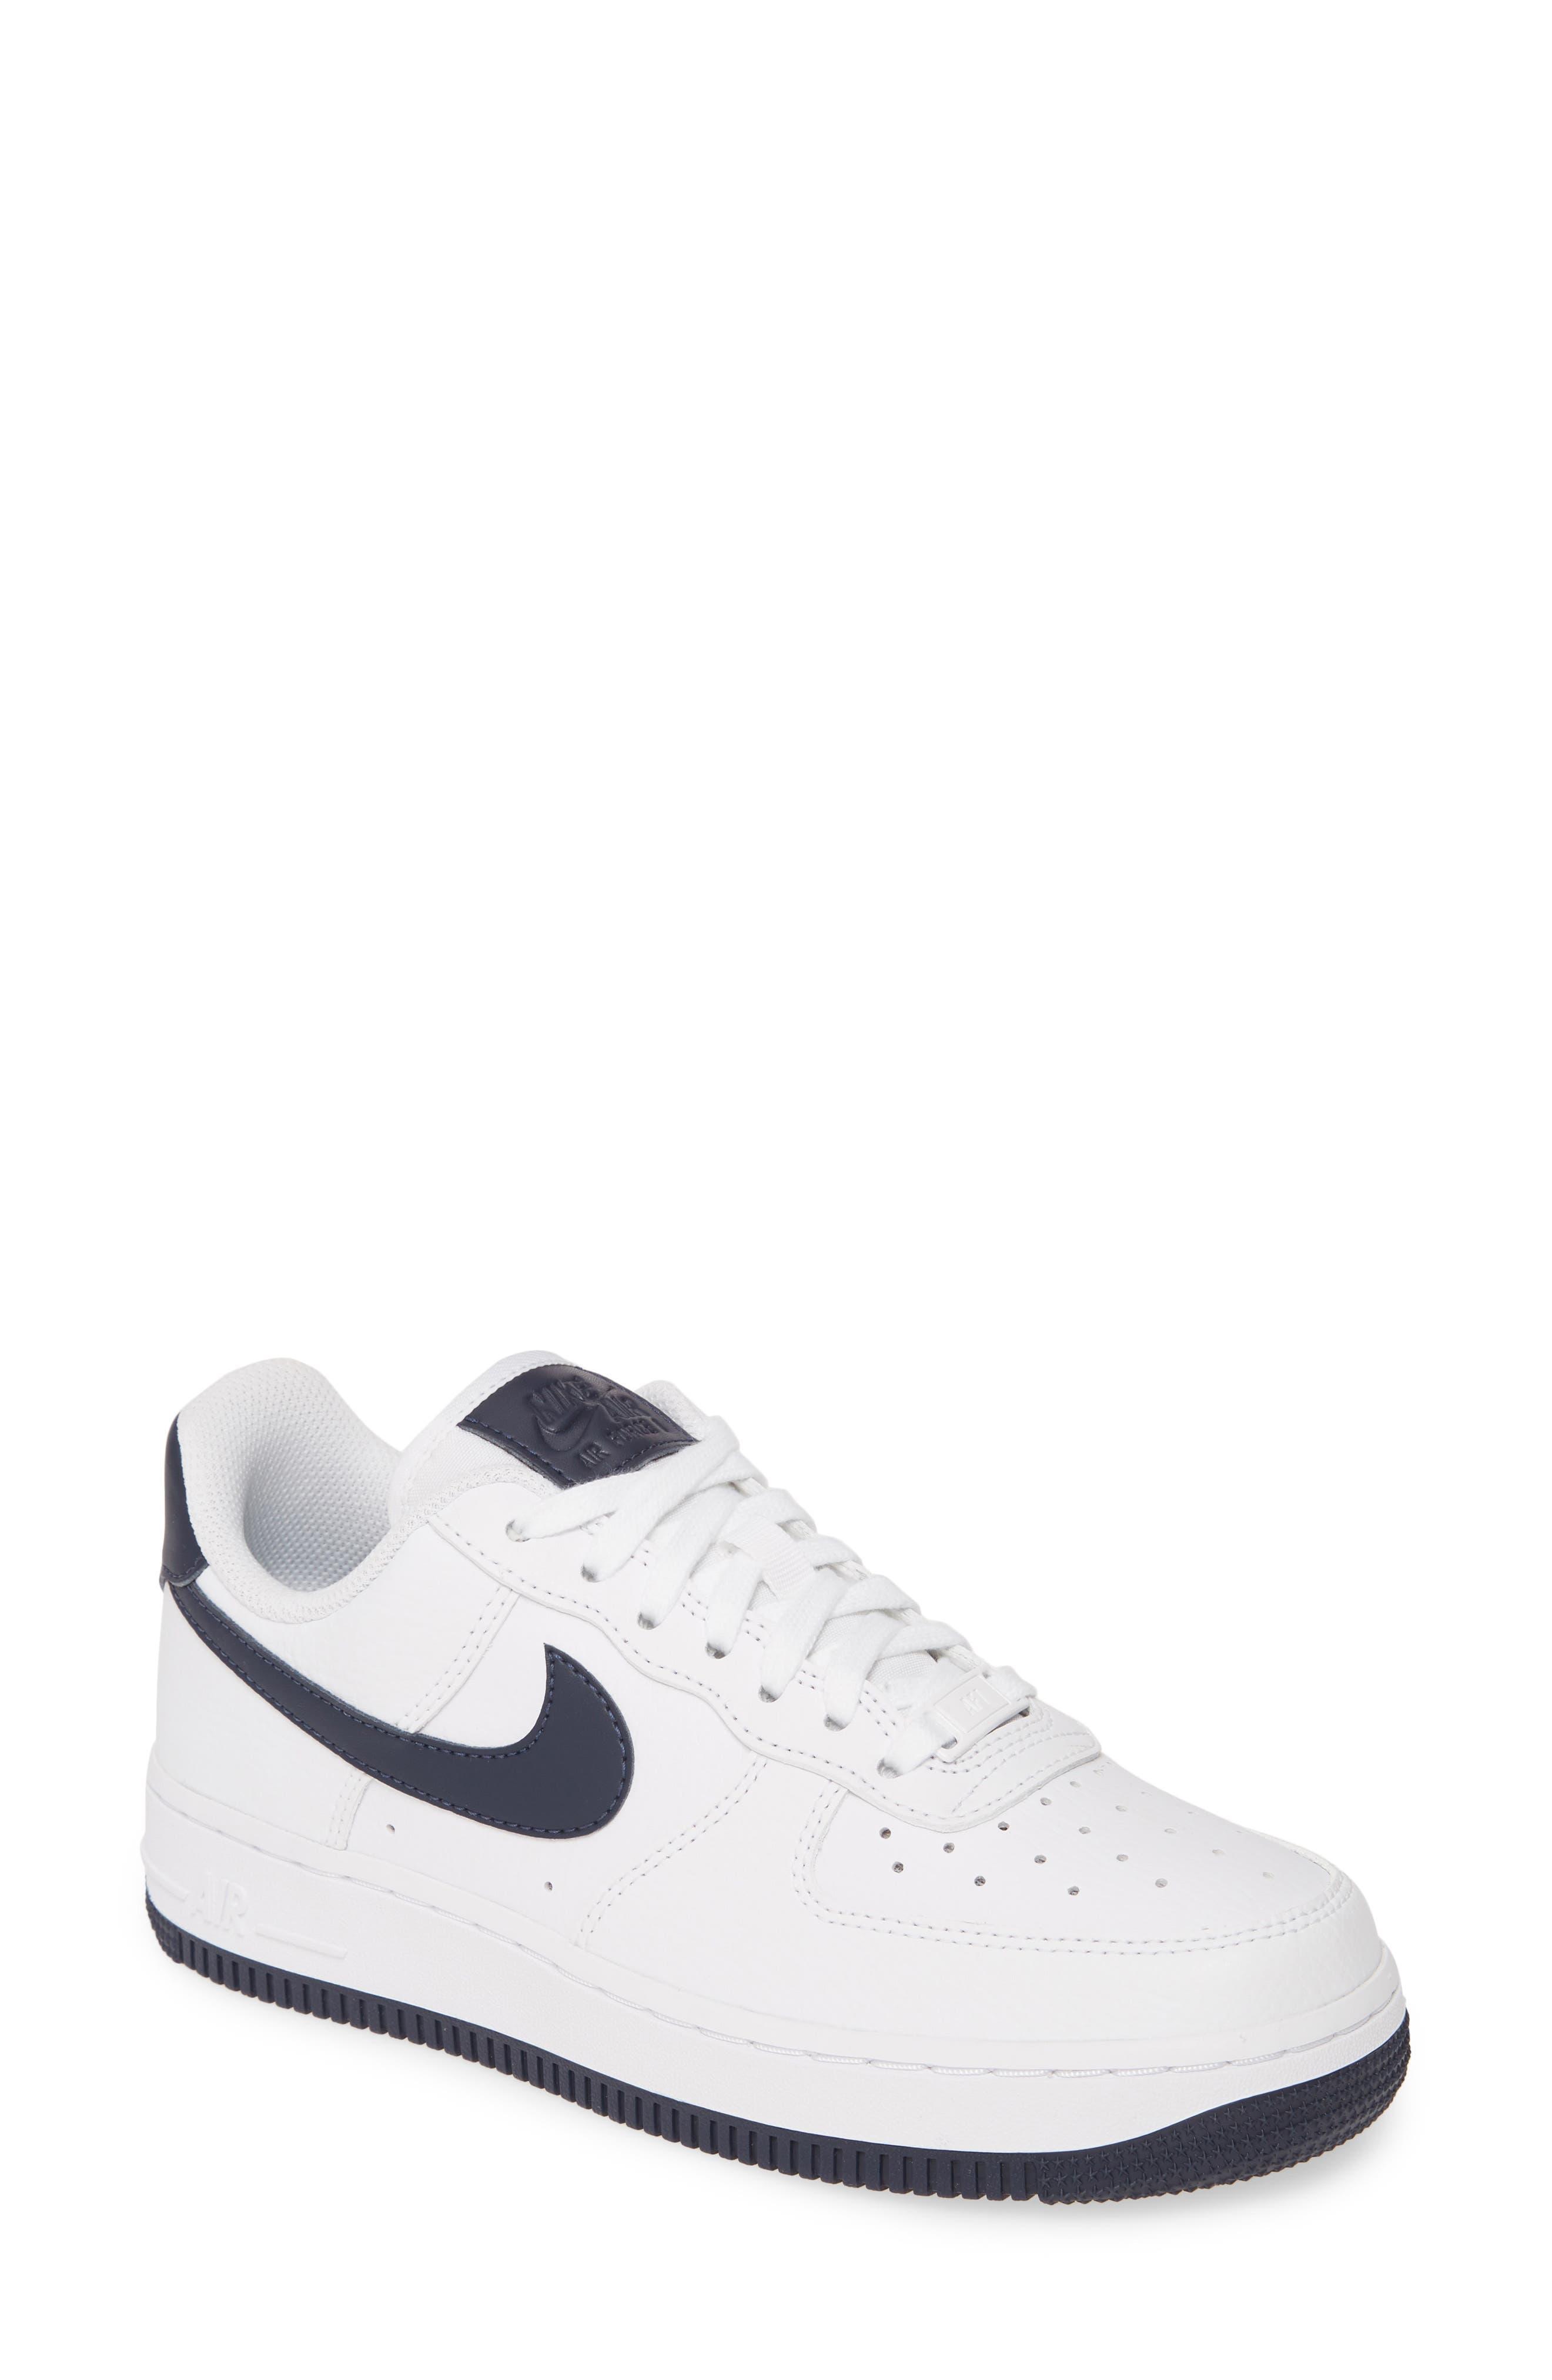 Nike BlackPure Platinum anthracite W Air Max 98 Ul '17 Sneakers Size US 8.5 Regular (M, B) 20% off retail